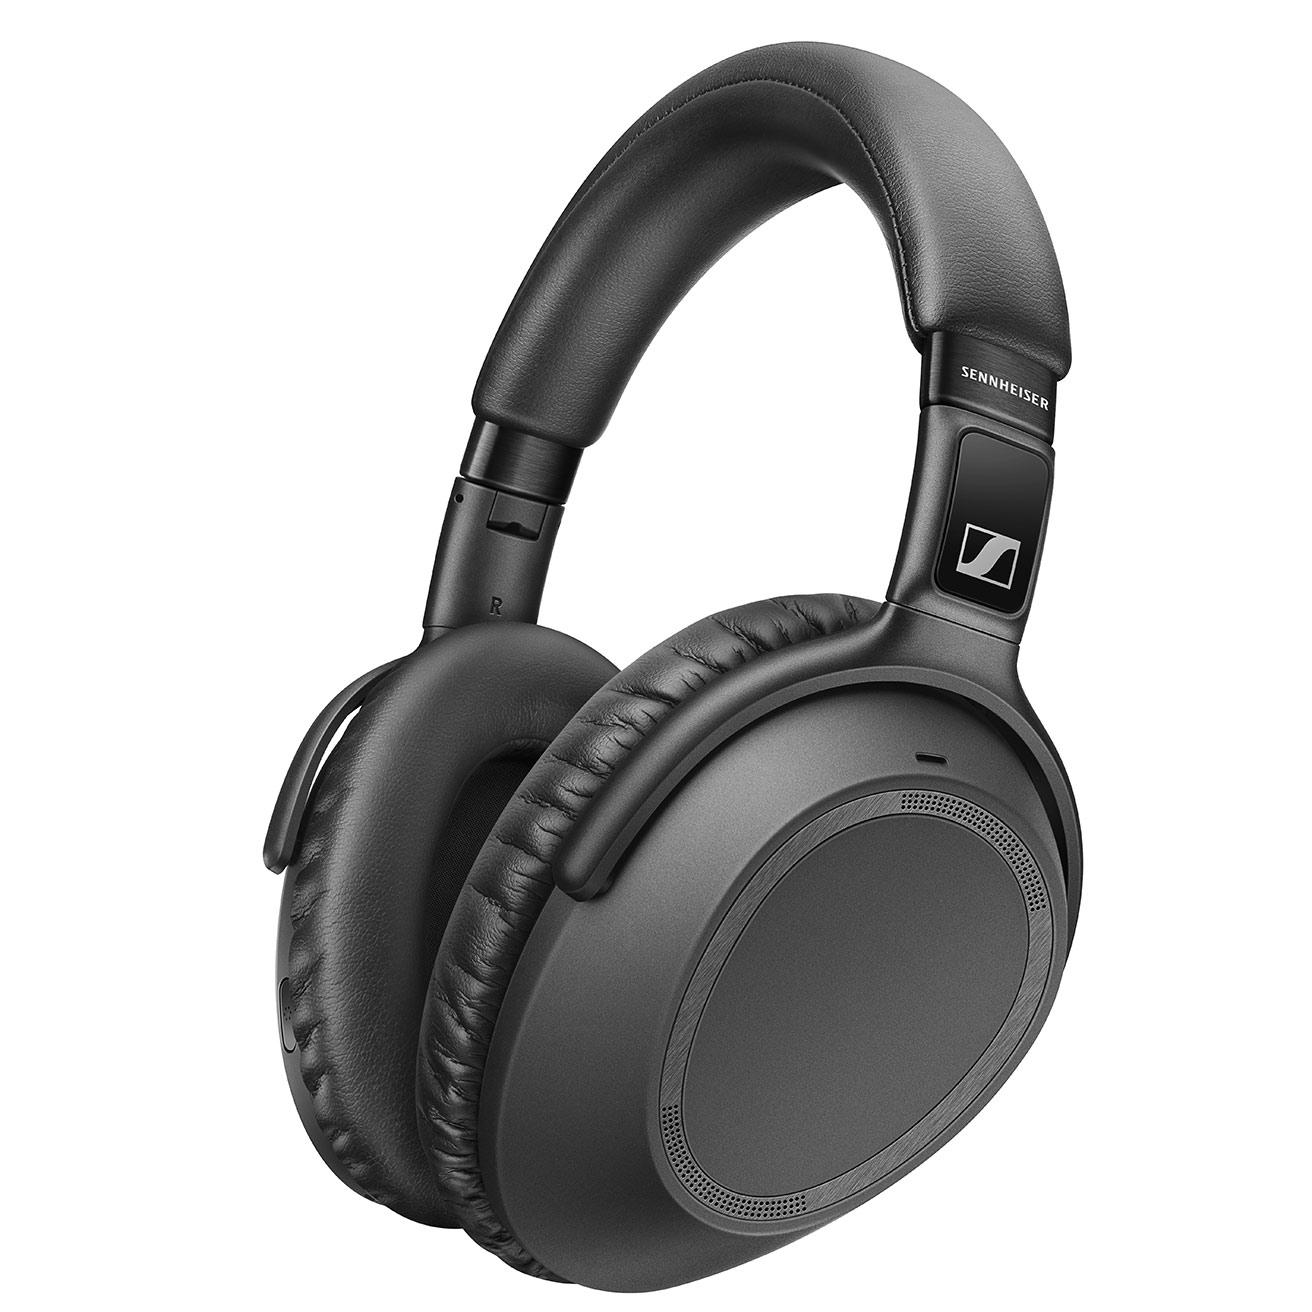 Sennheiser PXC 550-II Wireless Headphones B-stock £129 @ Sennheiser Shop